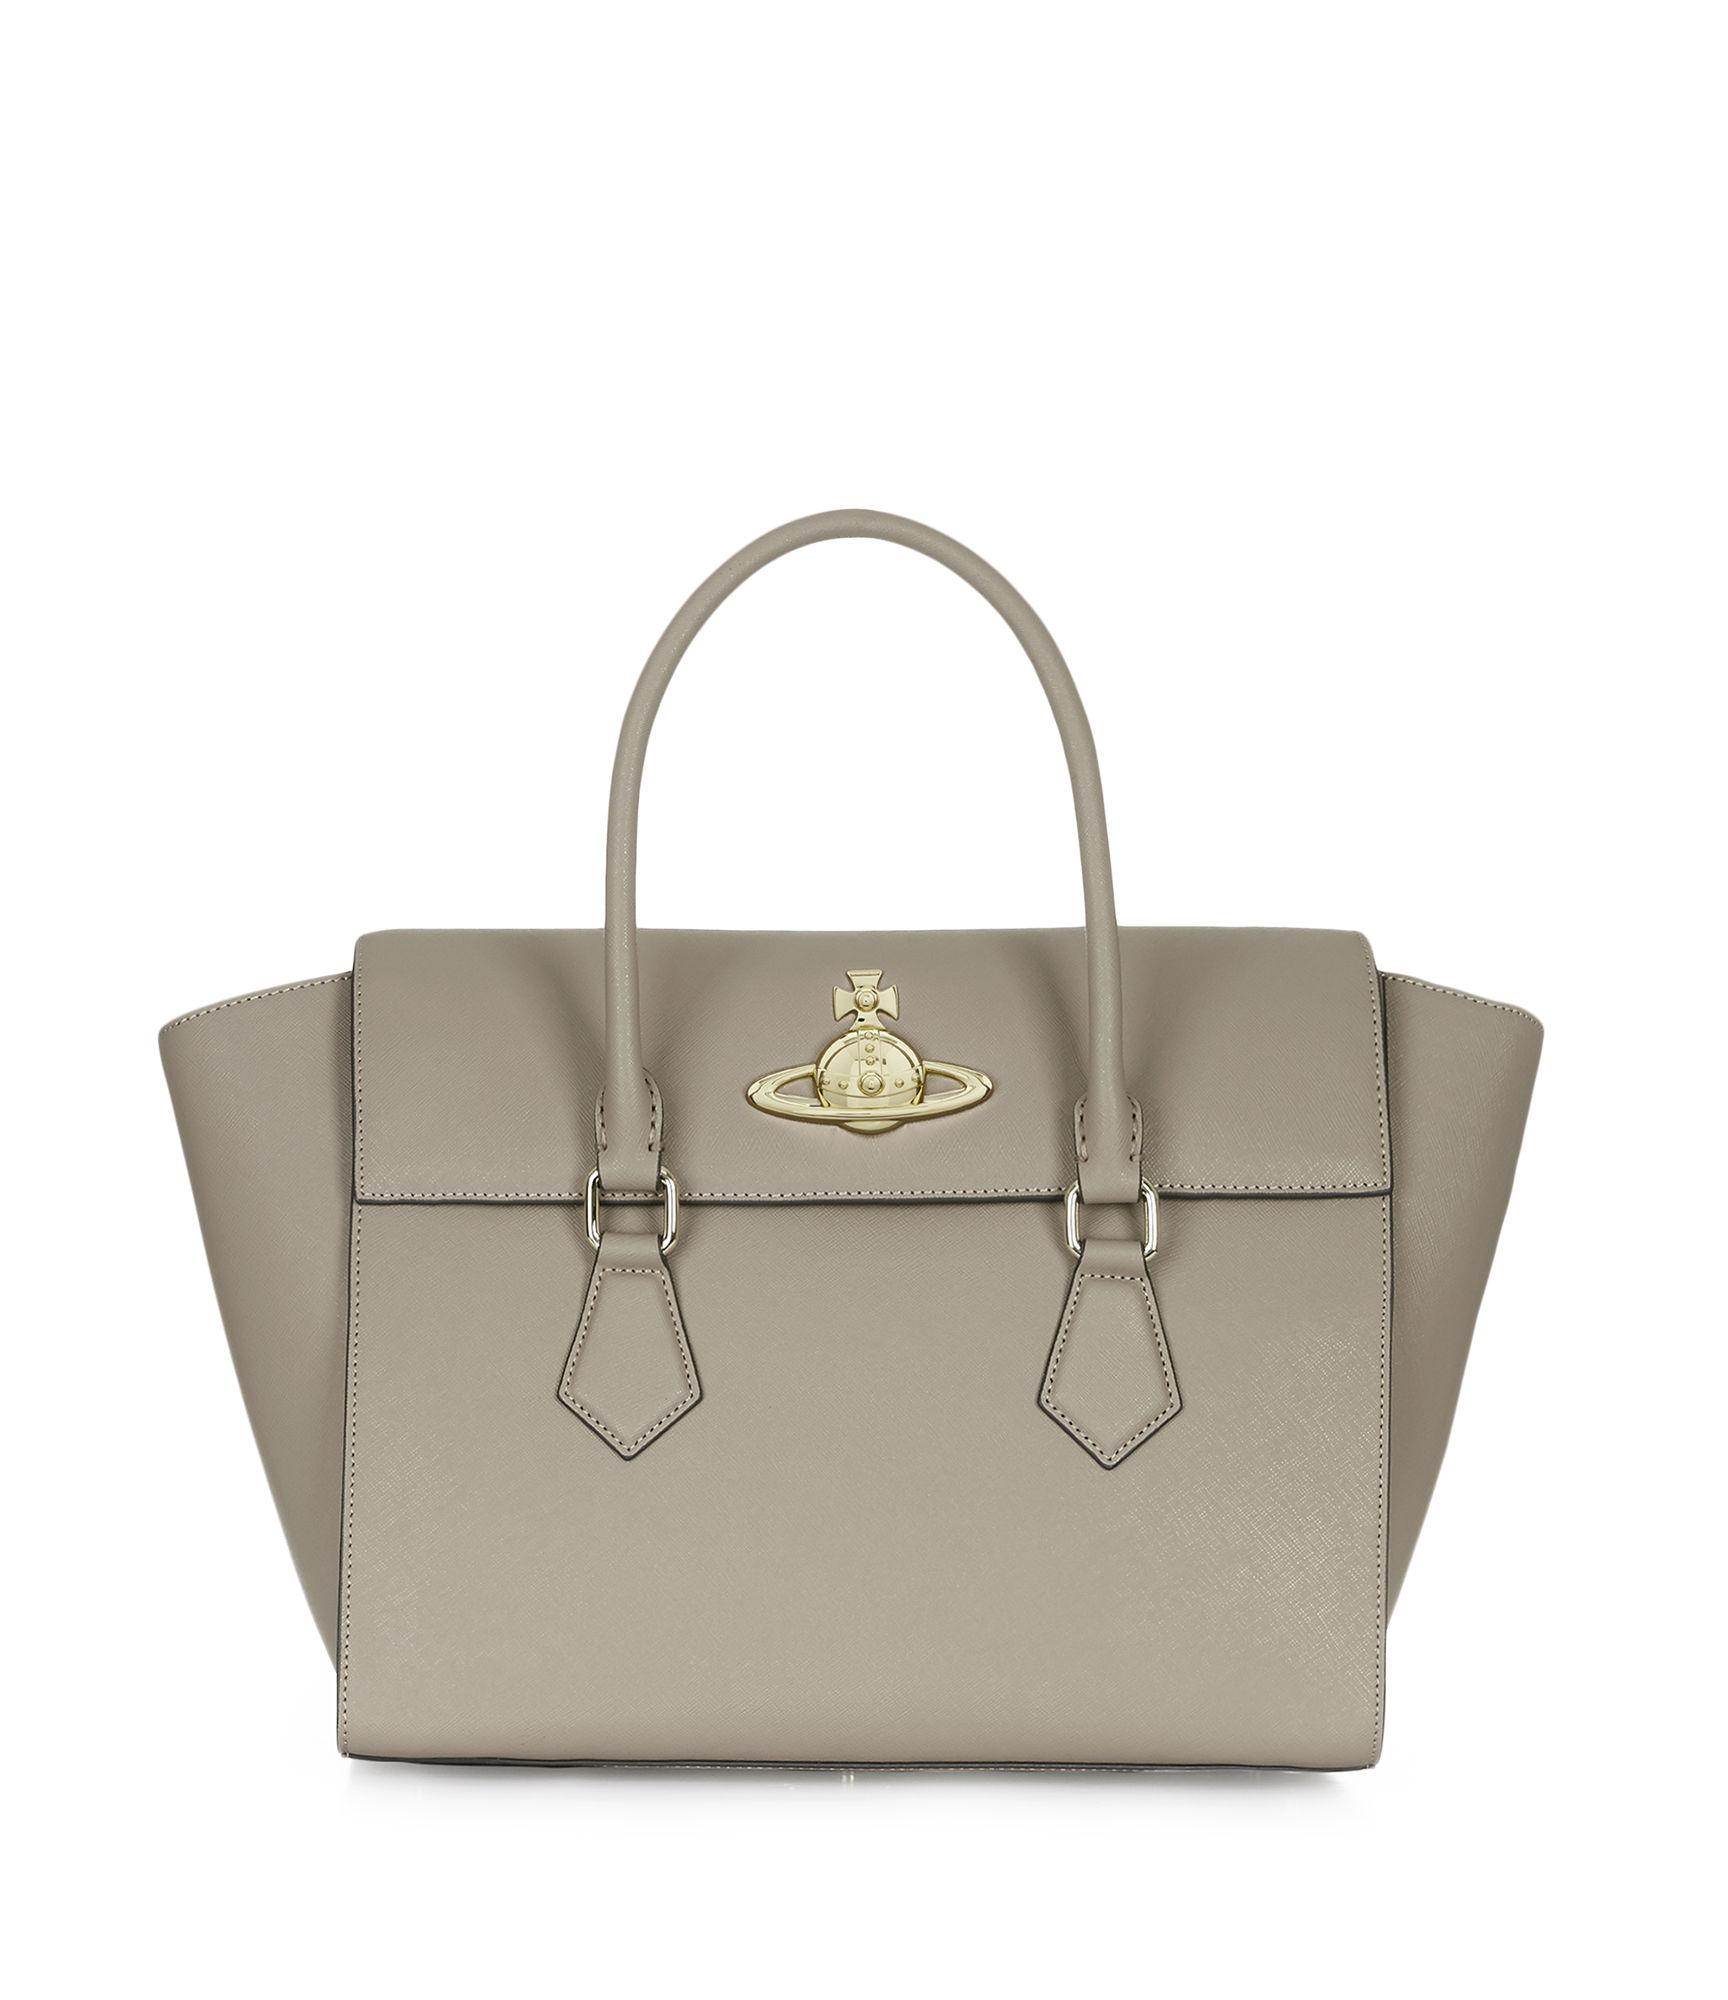 8567d74039e6 Vivienne Westwood Large Pimlico Handbag 42030036 Taupe | ModeSens